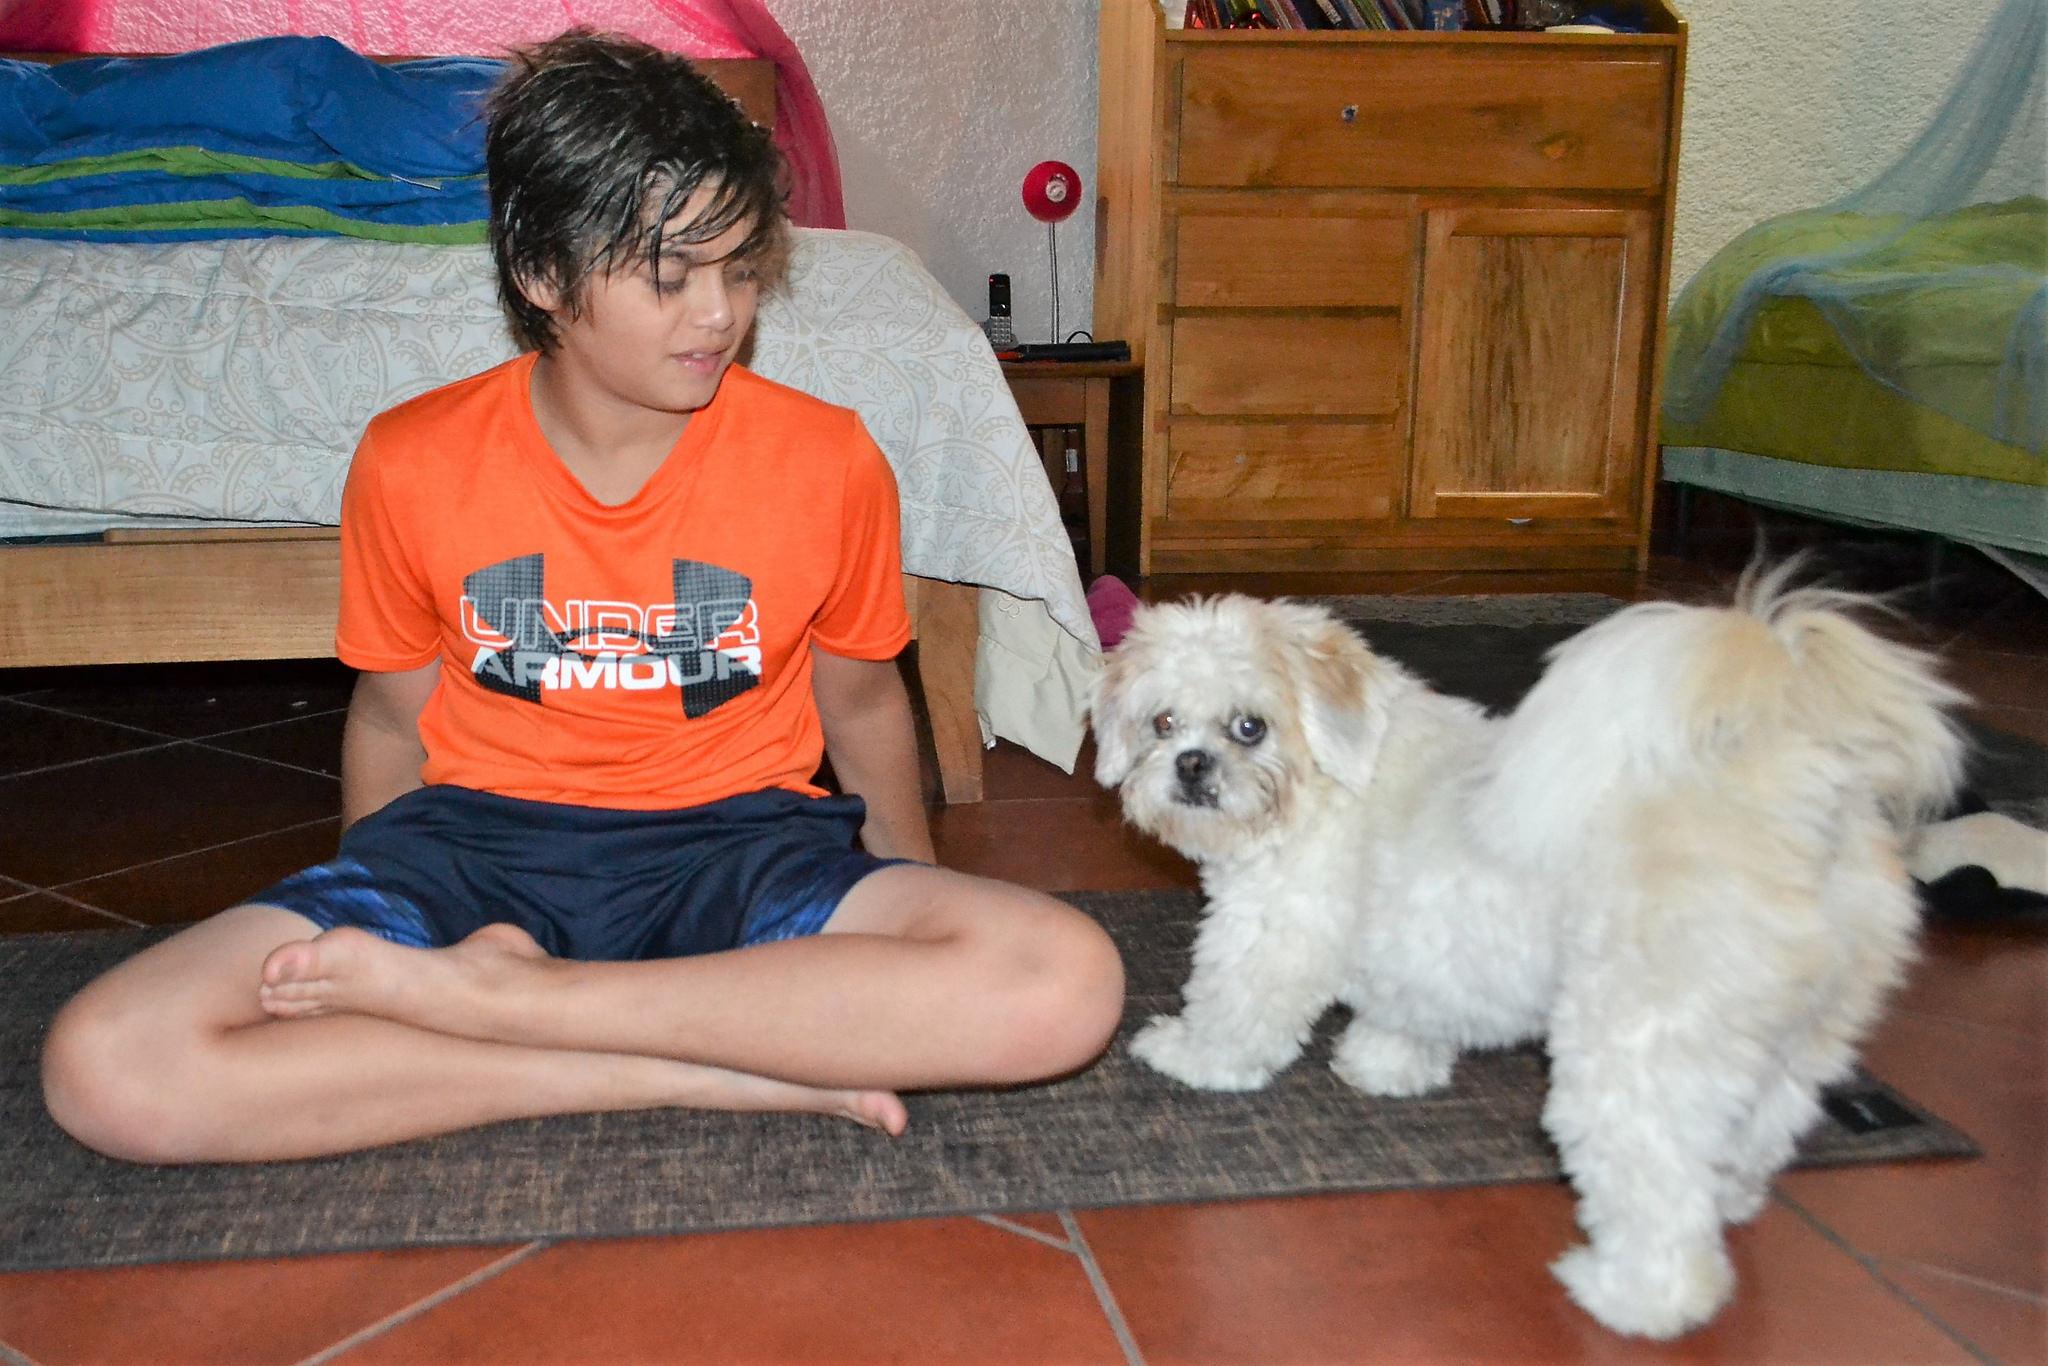 yoga mats for kids, yoga mats for dogs